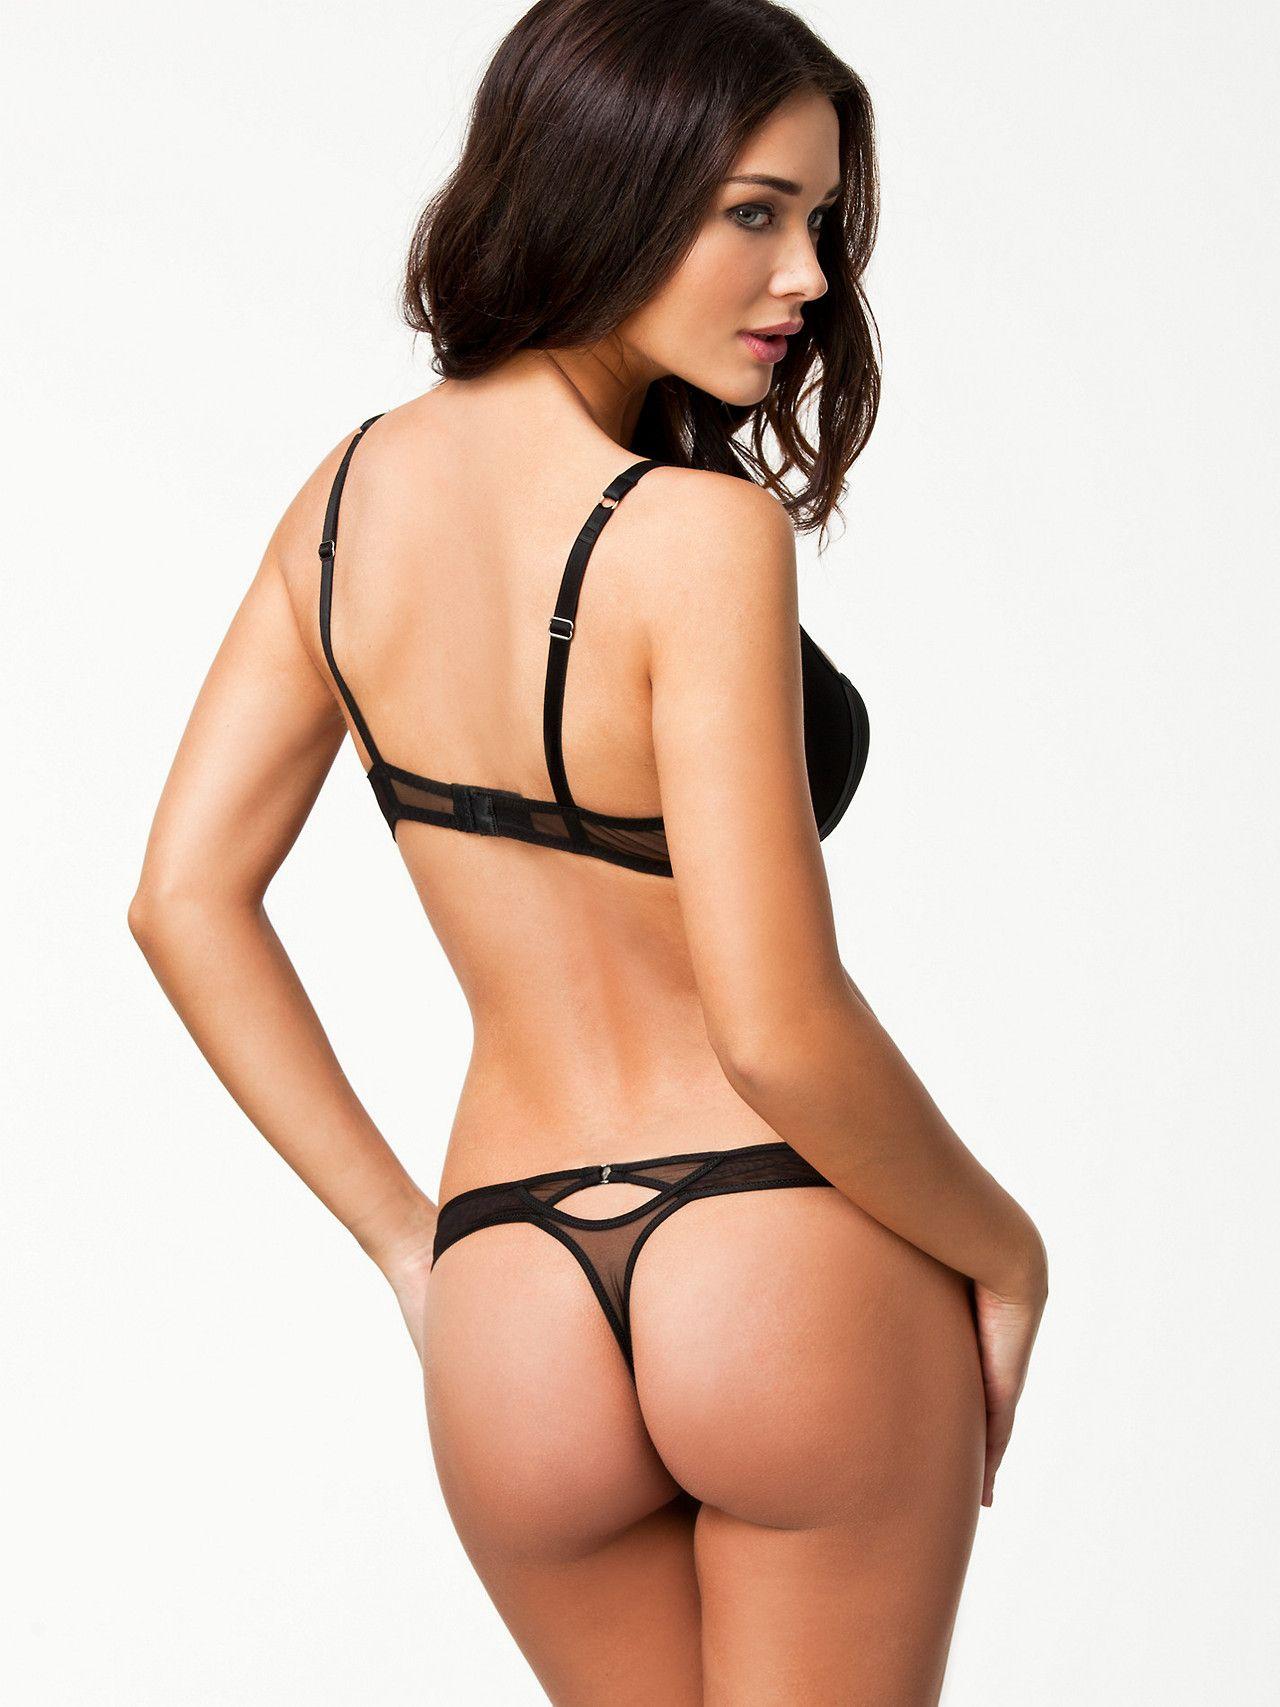 Amy jackson lingerie